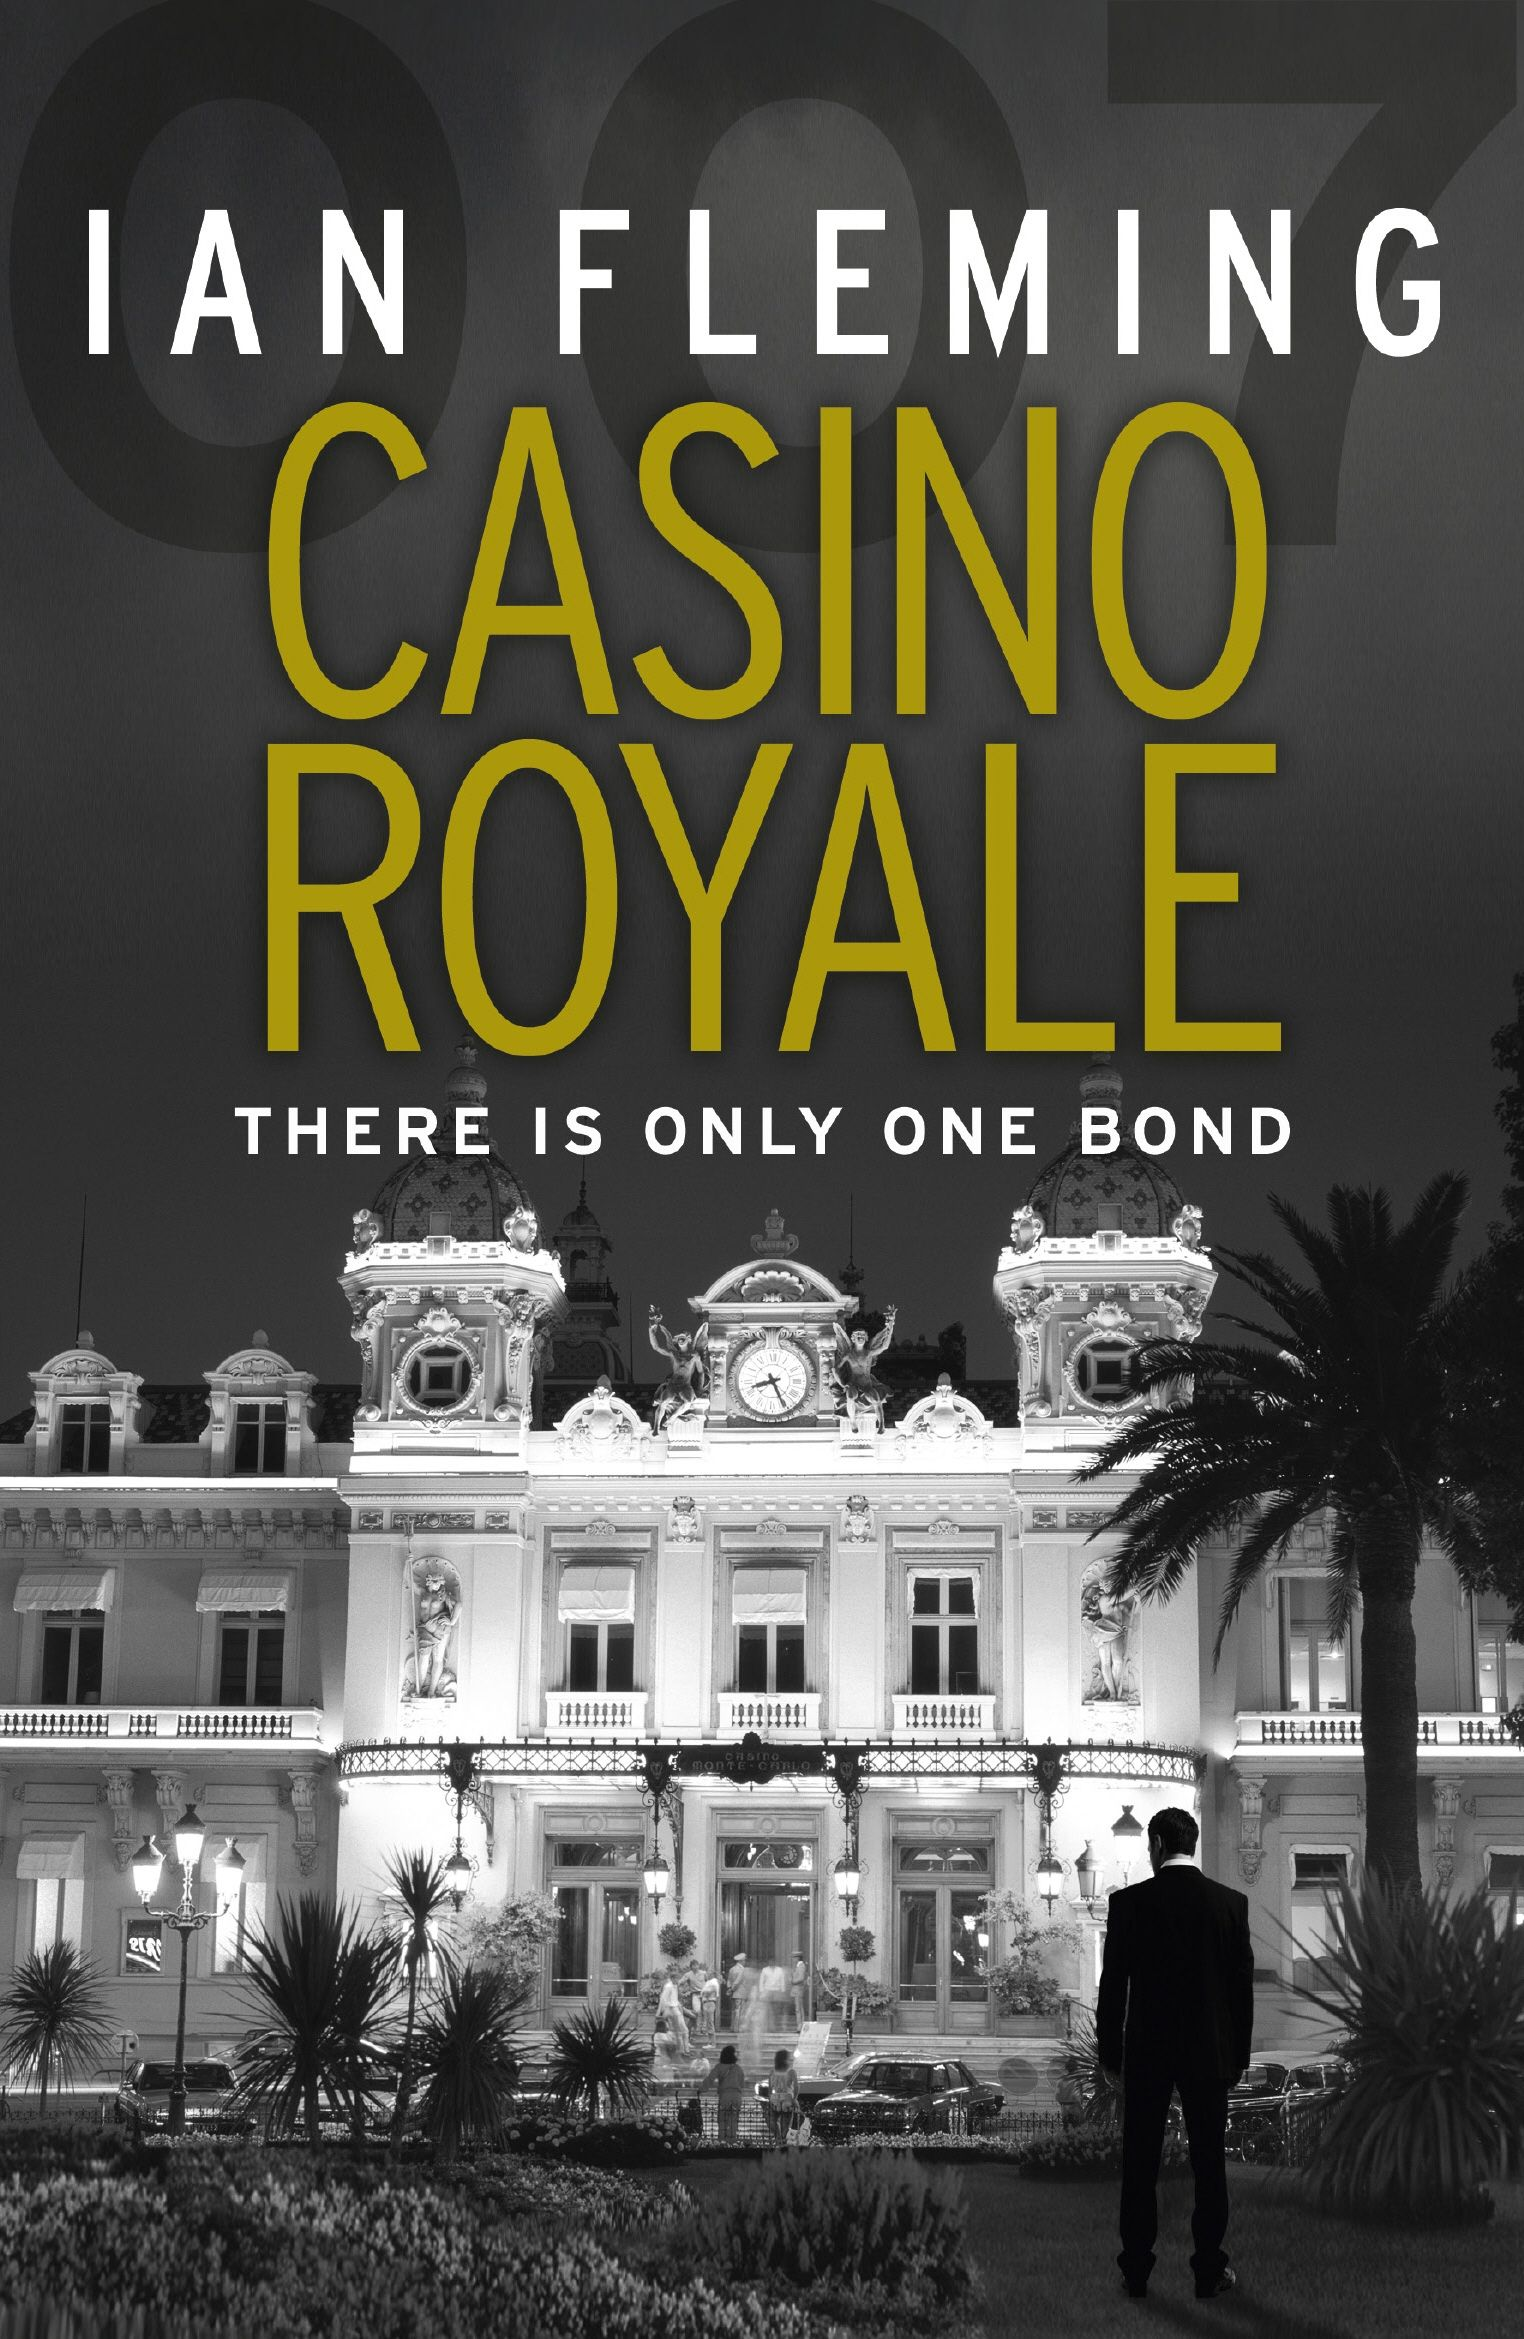 Bond casino fleming royale war orleans casino las vegas blackjack tournament april 2008